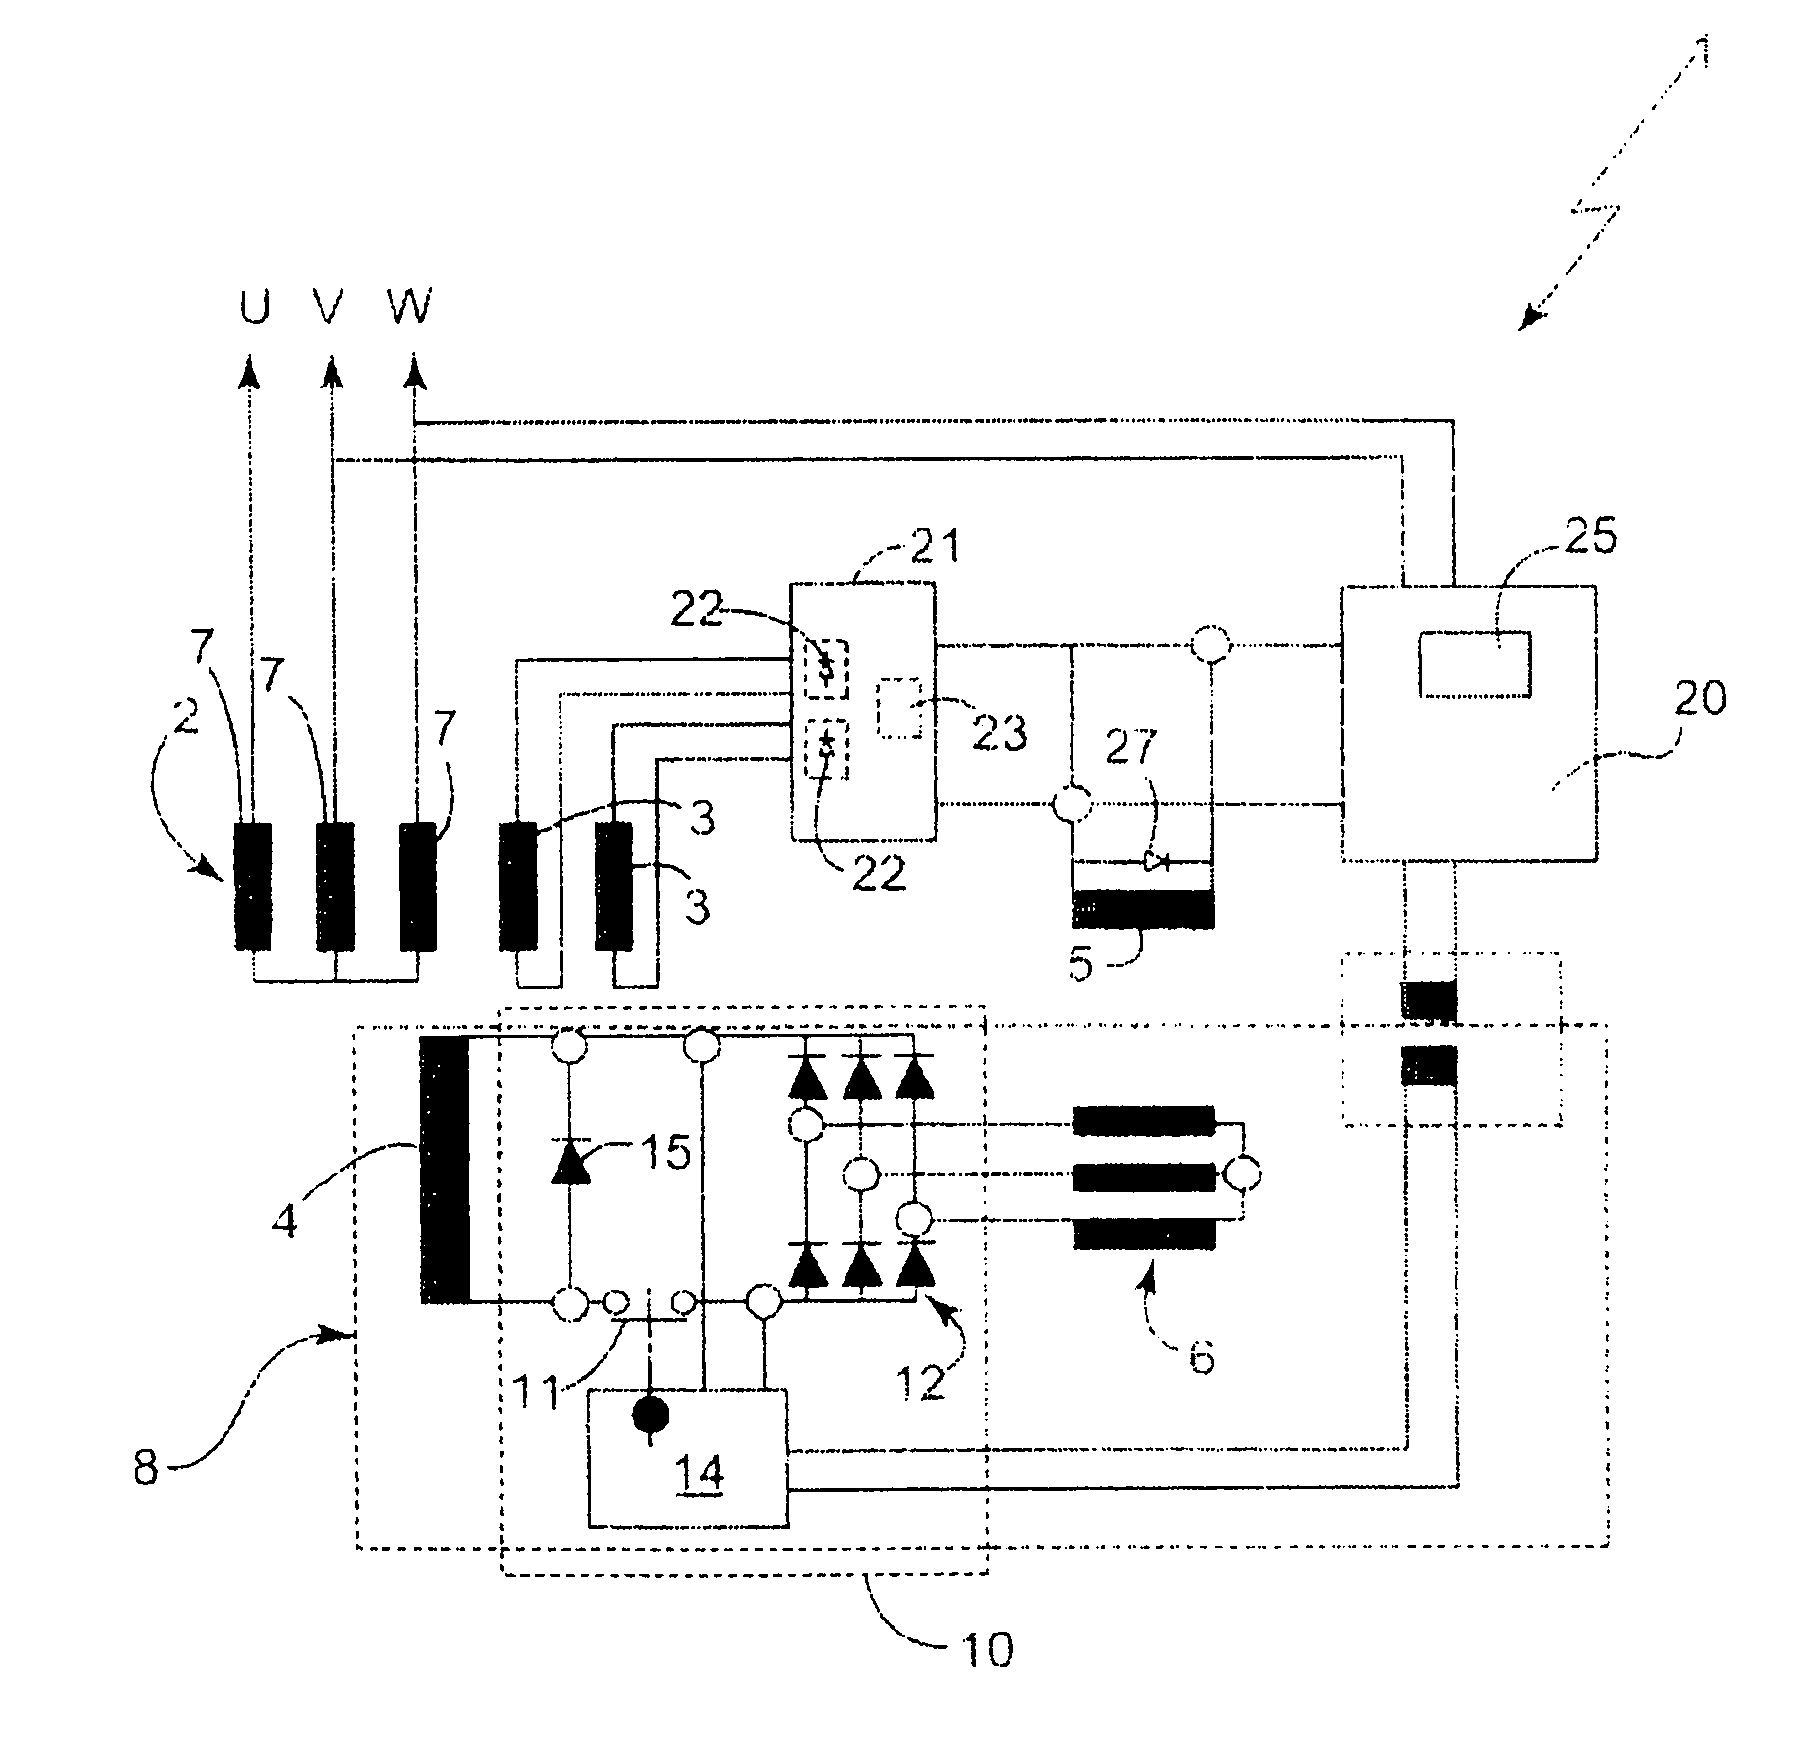 US08013578 20110906 D00000?resize\\\\\\\\\\\\\\\\\\\\\\\\\=665%2C642 portable generator wiring diagram & portable generator transfer Brushless Generator Wiring Diagram at aneh.co